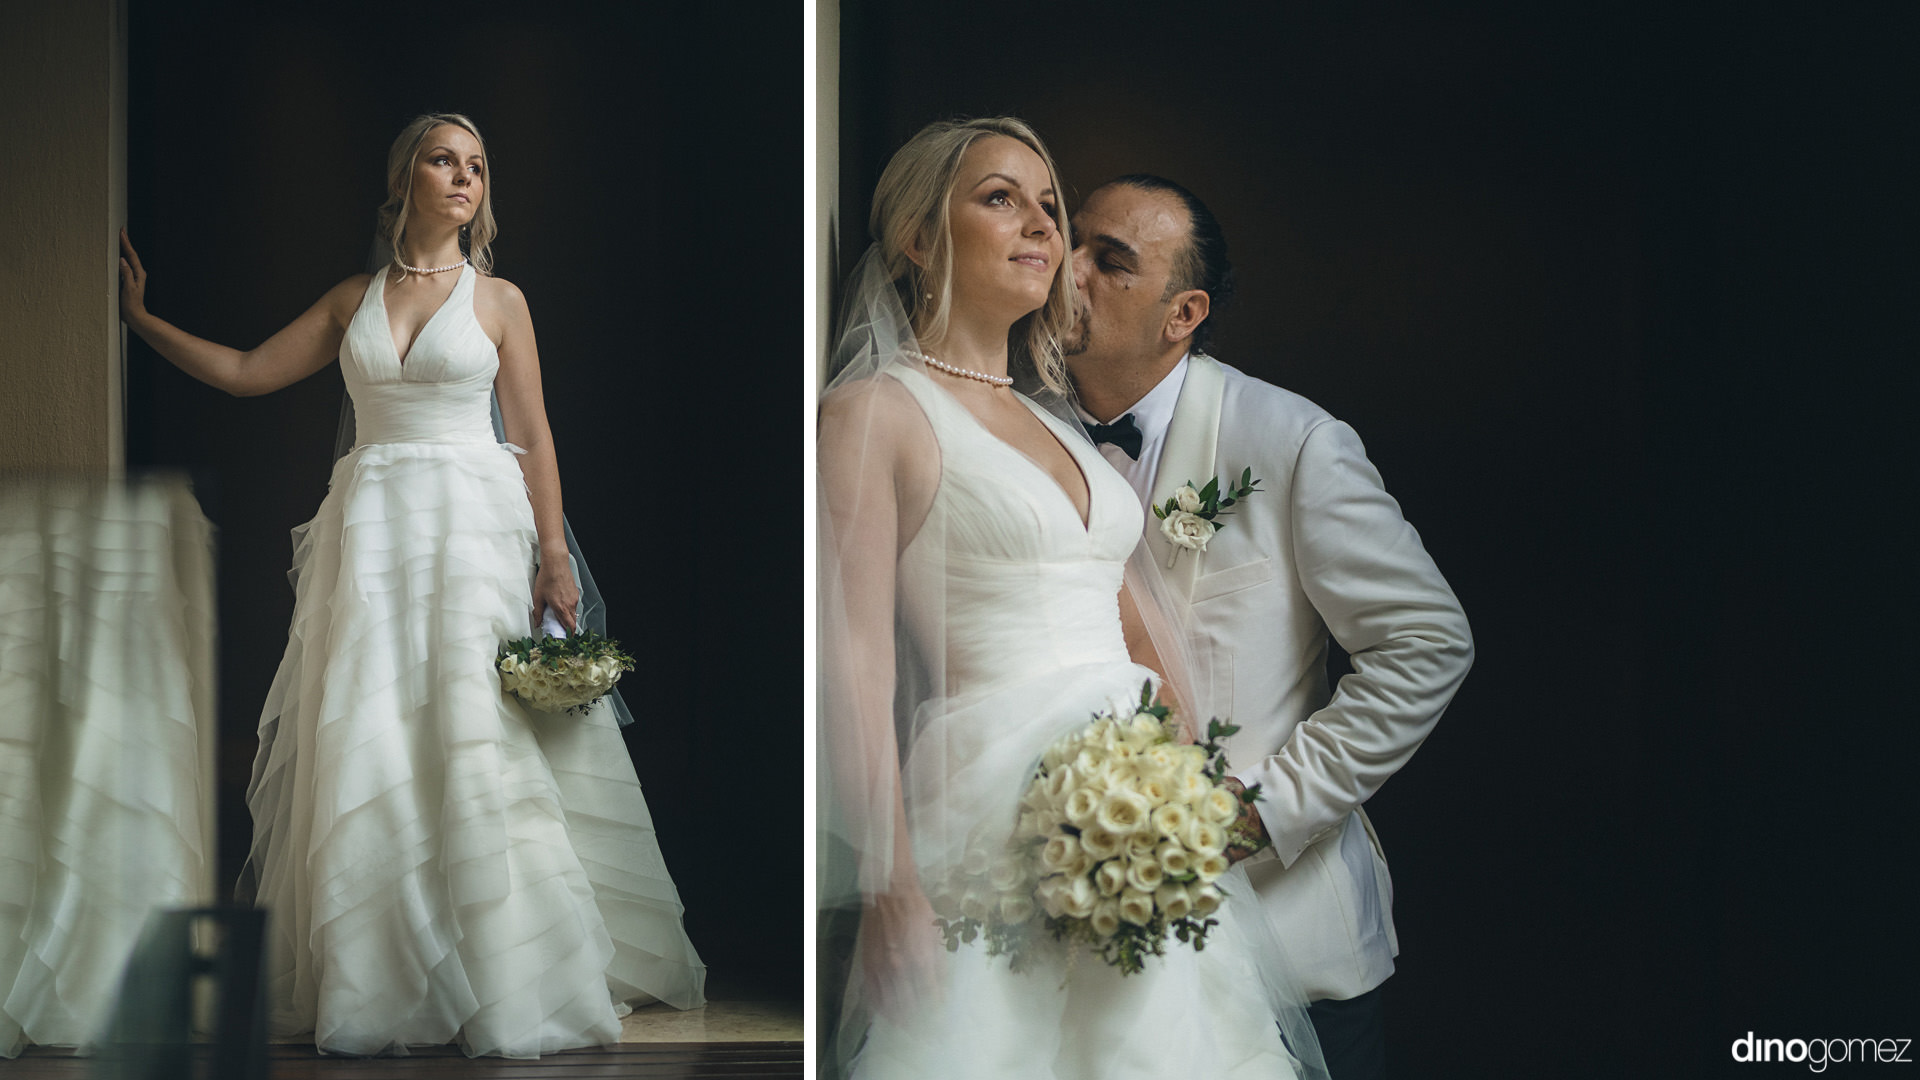 Destination Wedding At Movich Cartagena De Indias Photographers - St